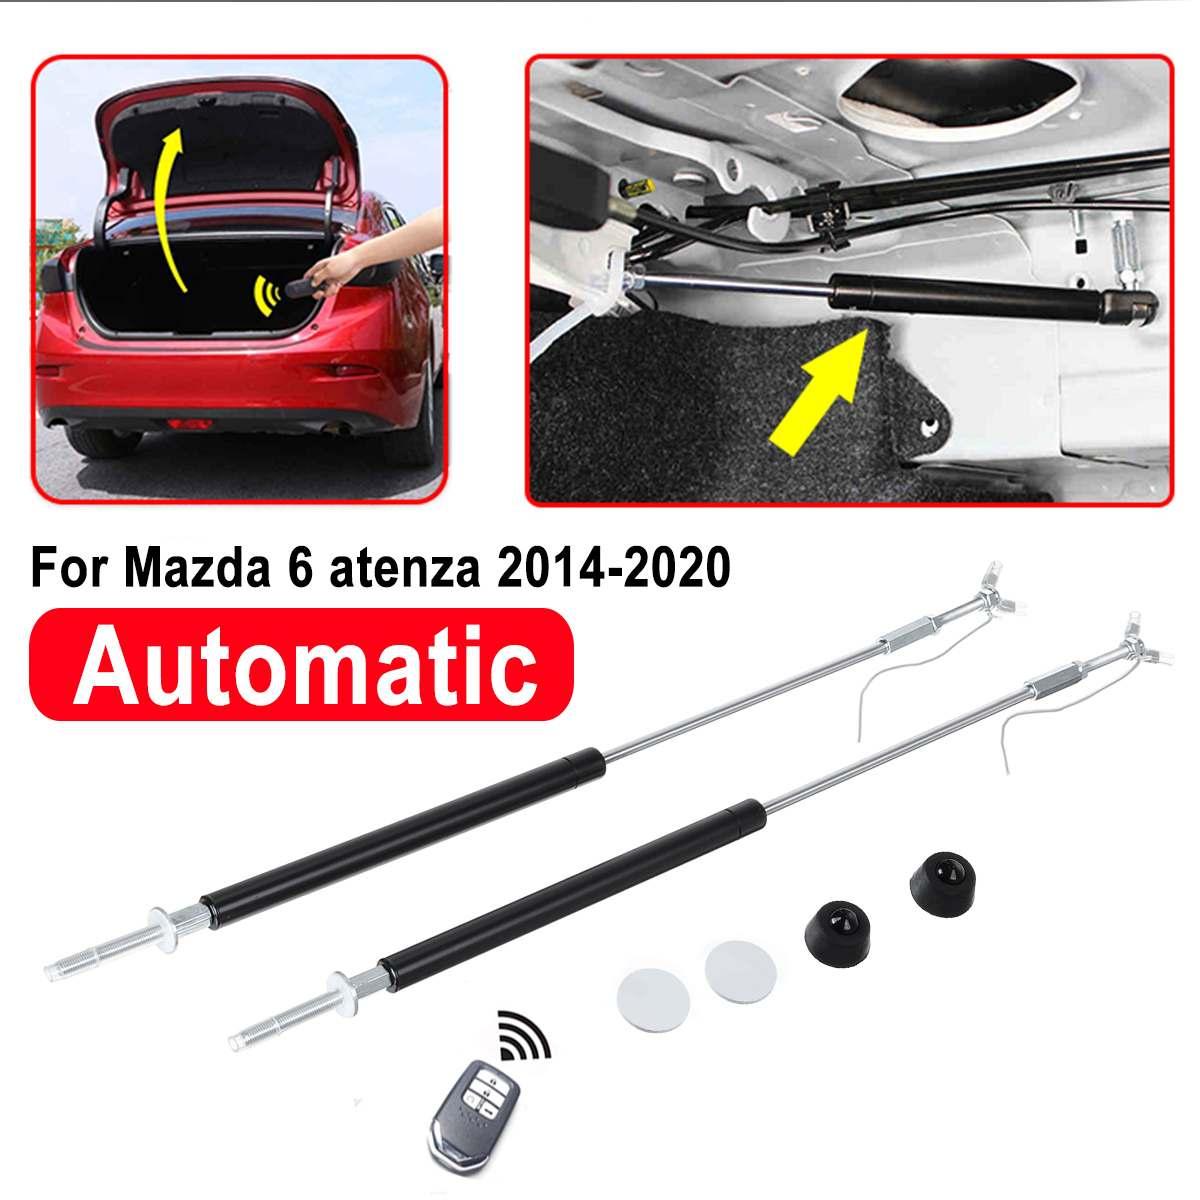 Automatic Refit Rear Tailgate Back Trunk Door Spring Shock Lifting Bracket Hydraulic Rod Strut Bars For-Mazda 6 atenza 2014-2020(China)